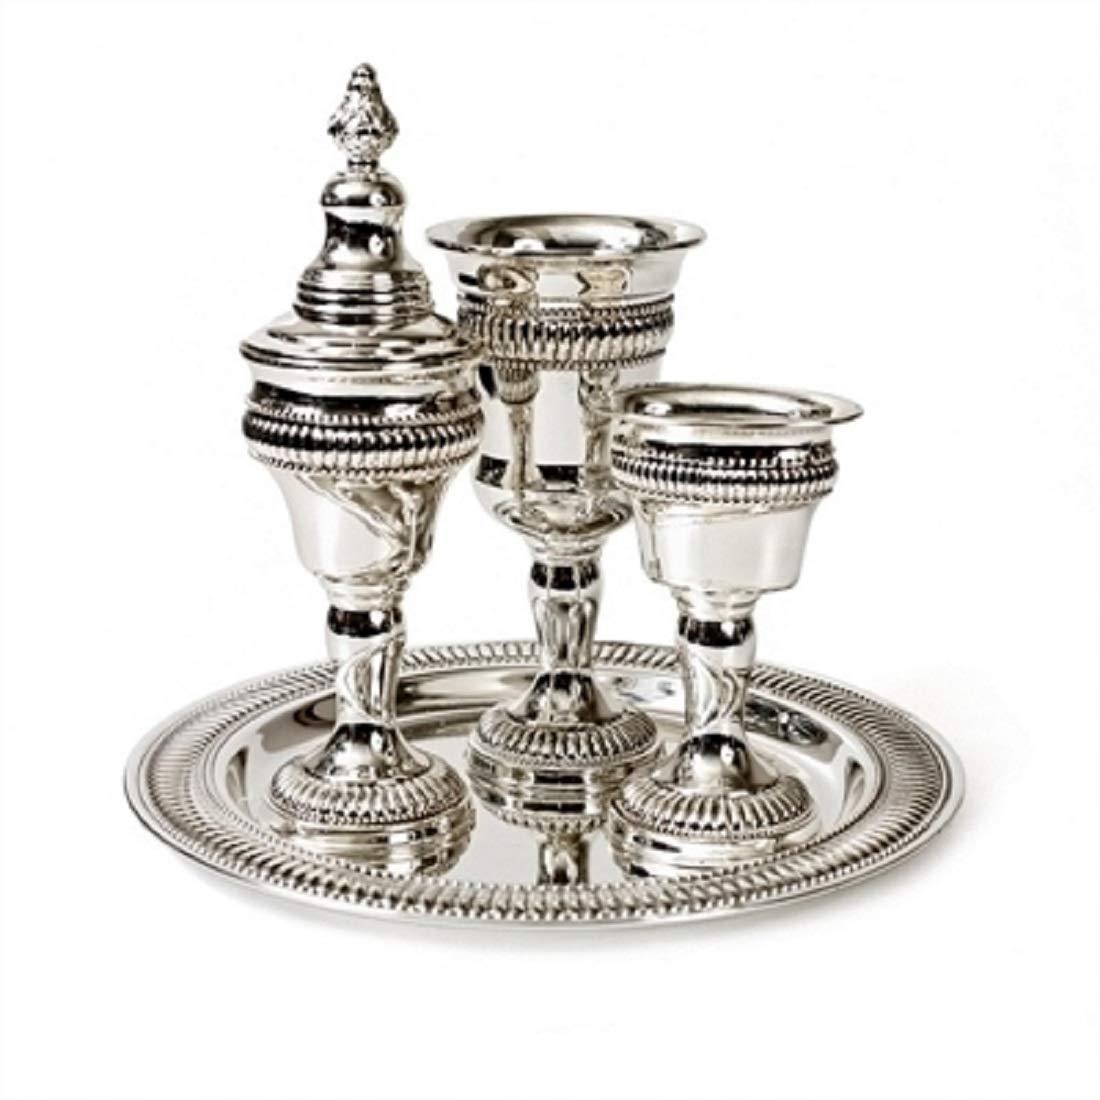 Modern Silverplated Havdalah Set, Non-Tarnish